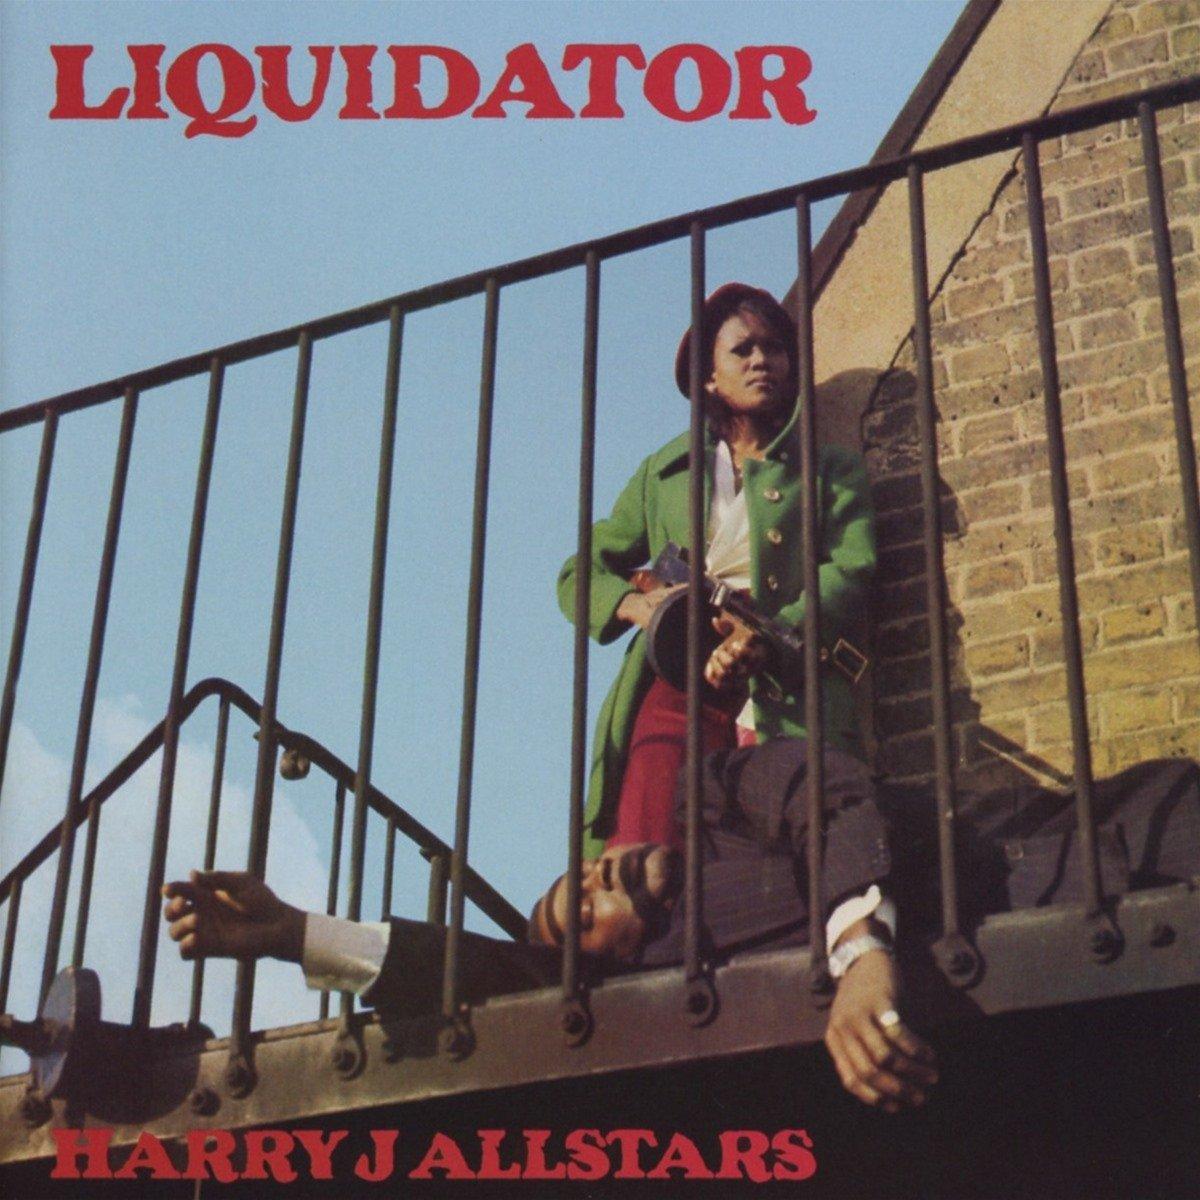 CD : Harry J Allstars - Liquidator (Expanded Version, United Kingdom - Import)